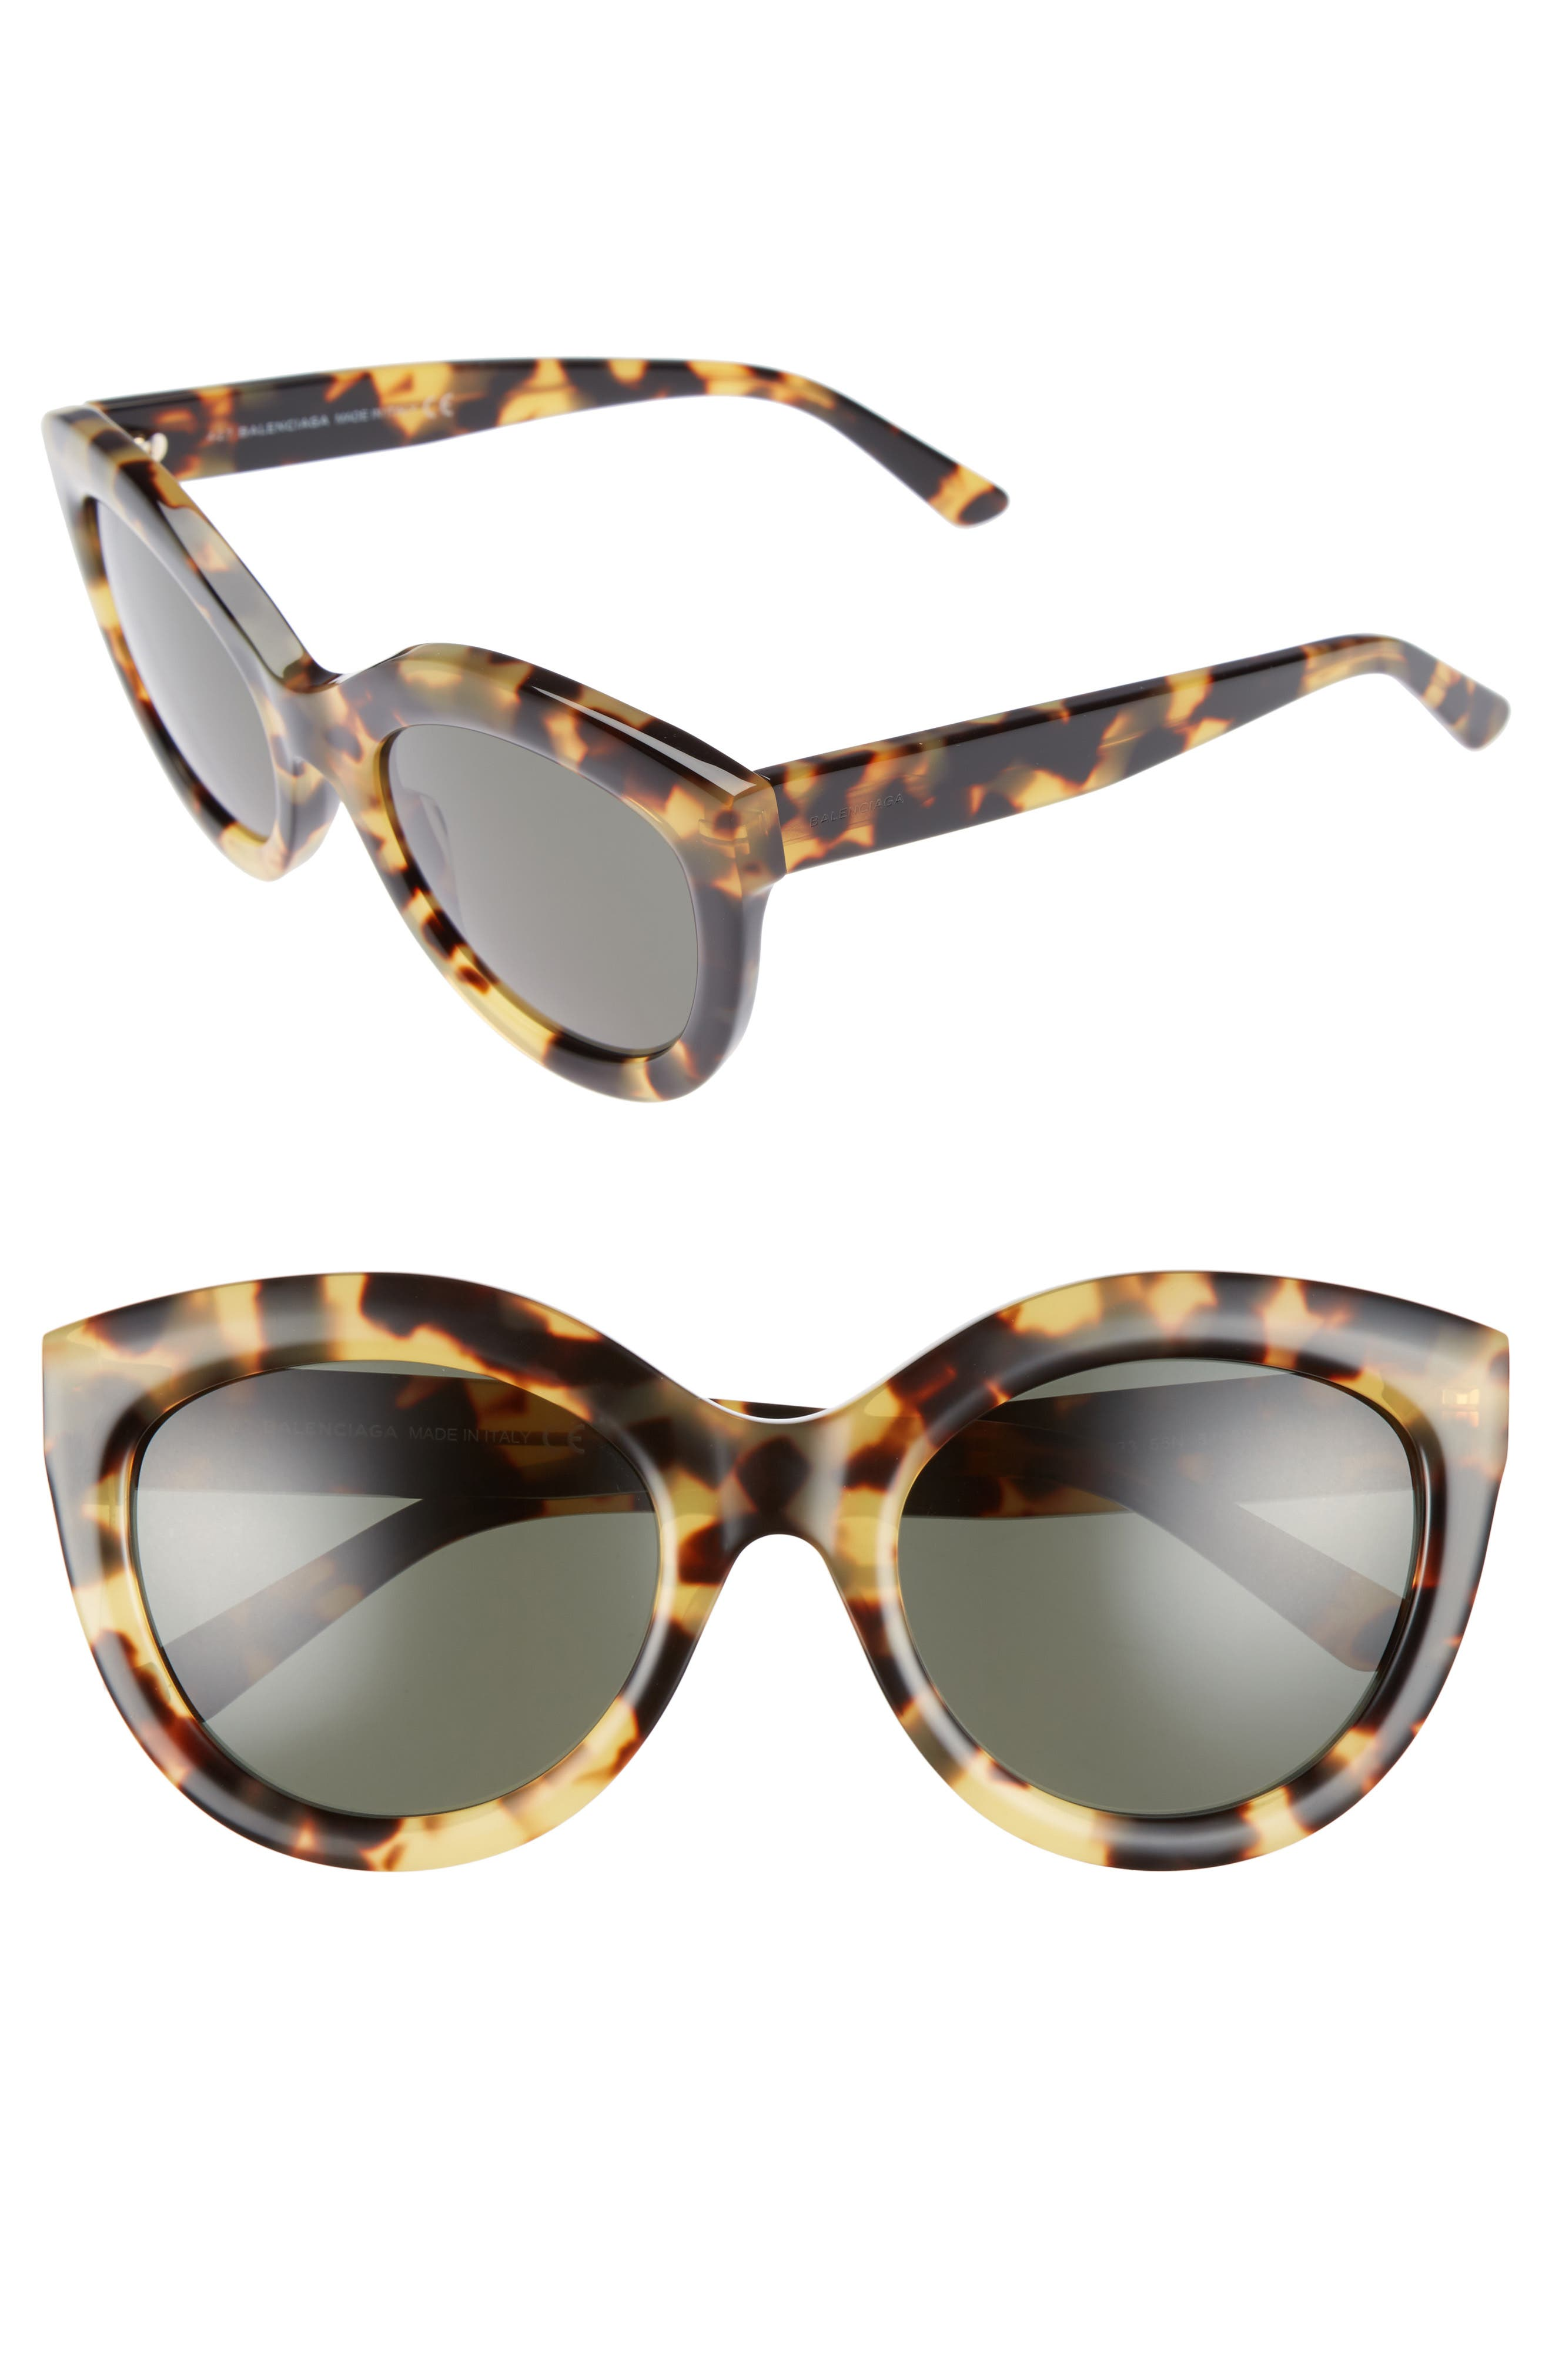 54mm Cat Eye Sunglasses,                             Main thumbnail 1, color,                             VINTAGE HAVANA/ GREEN LENS